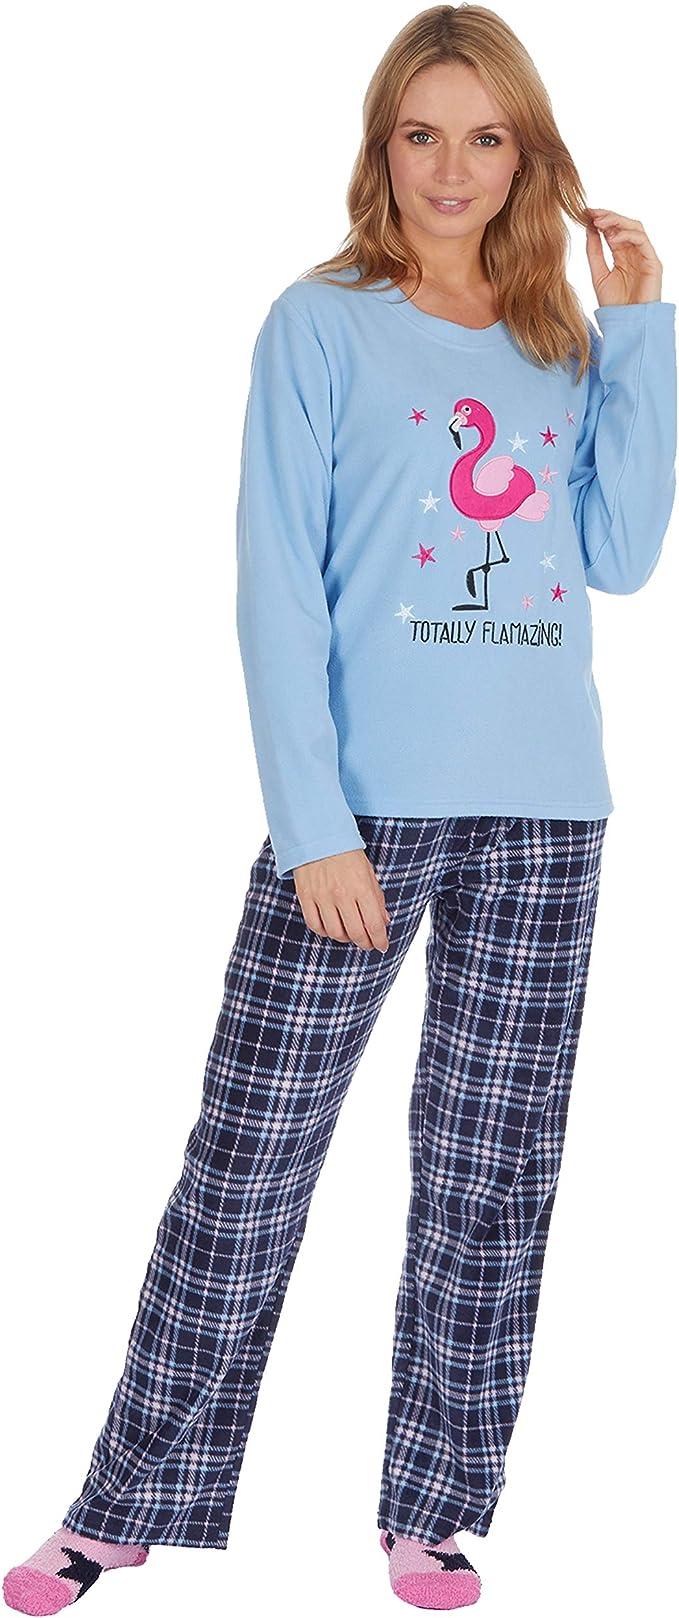 Forever Dreaming Ladies Checked Fleece Pyjama Set